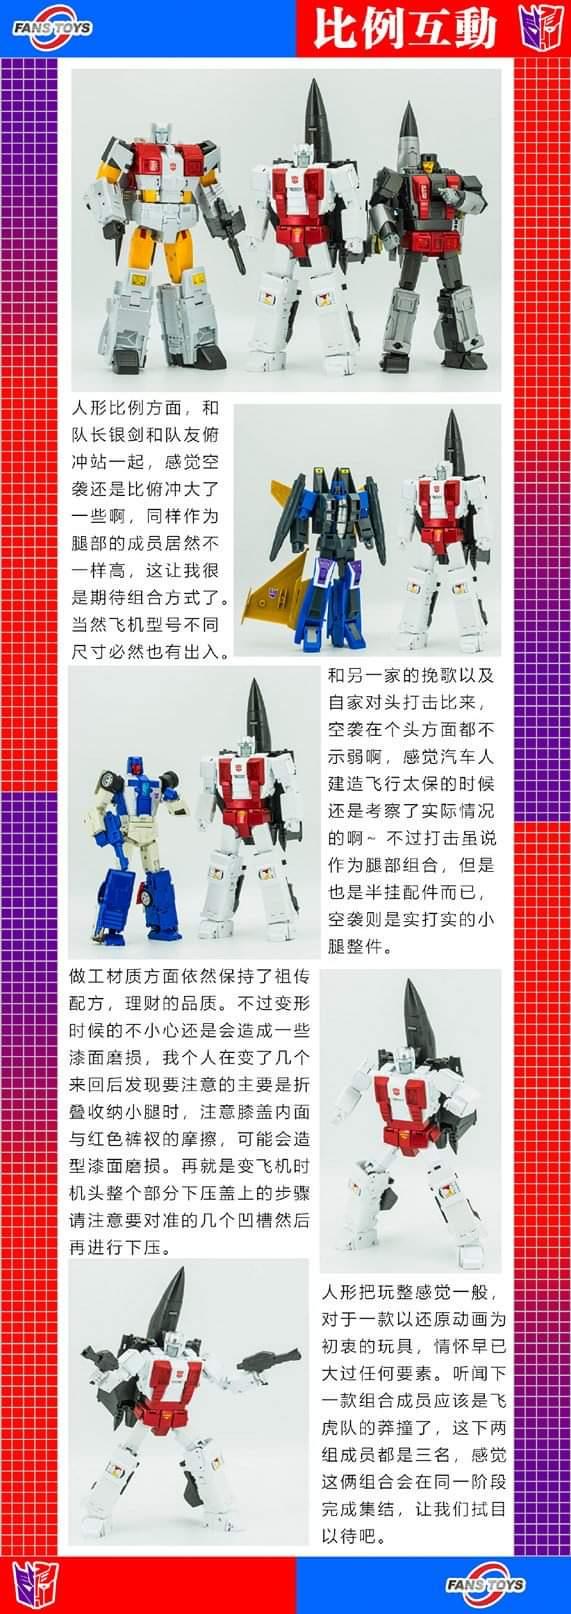 [Fanstoys] Produit Tiers - Jouet FT-30 Ethereaon (FT-30A à FT-30E) - aka Superion - Page 4 UUts35v6_o